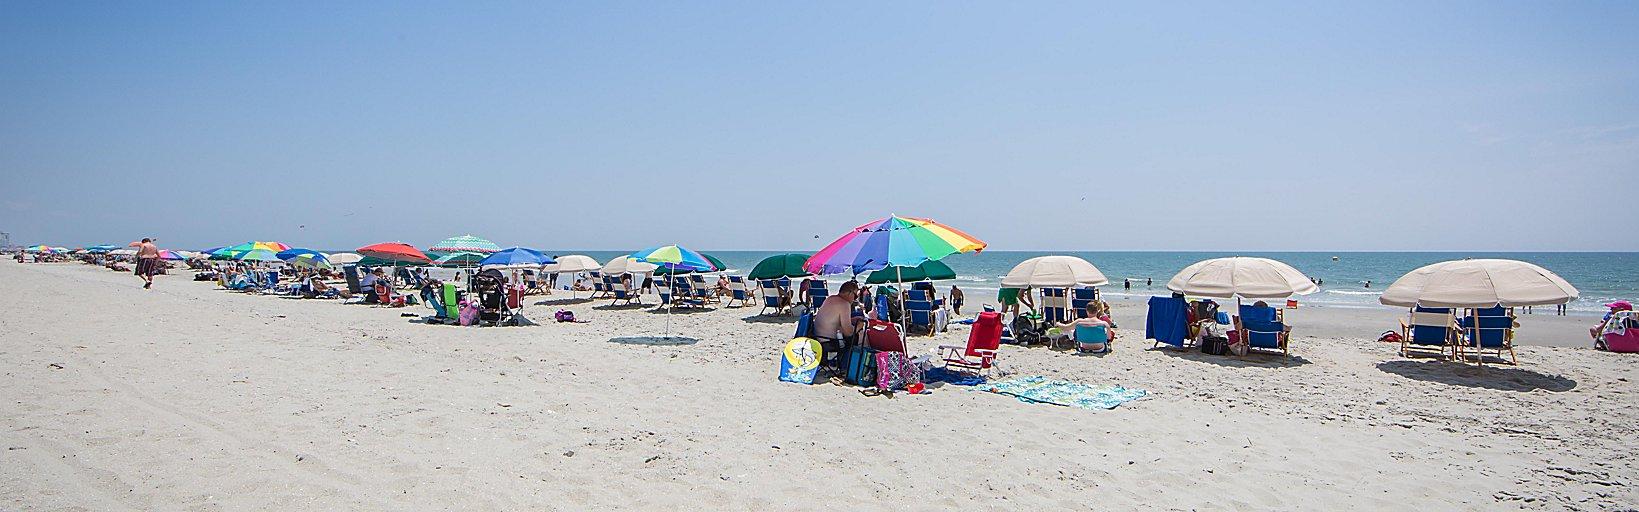 Holiday Inn Club Vacations South Beach